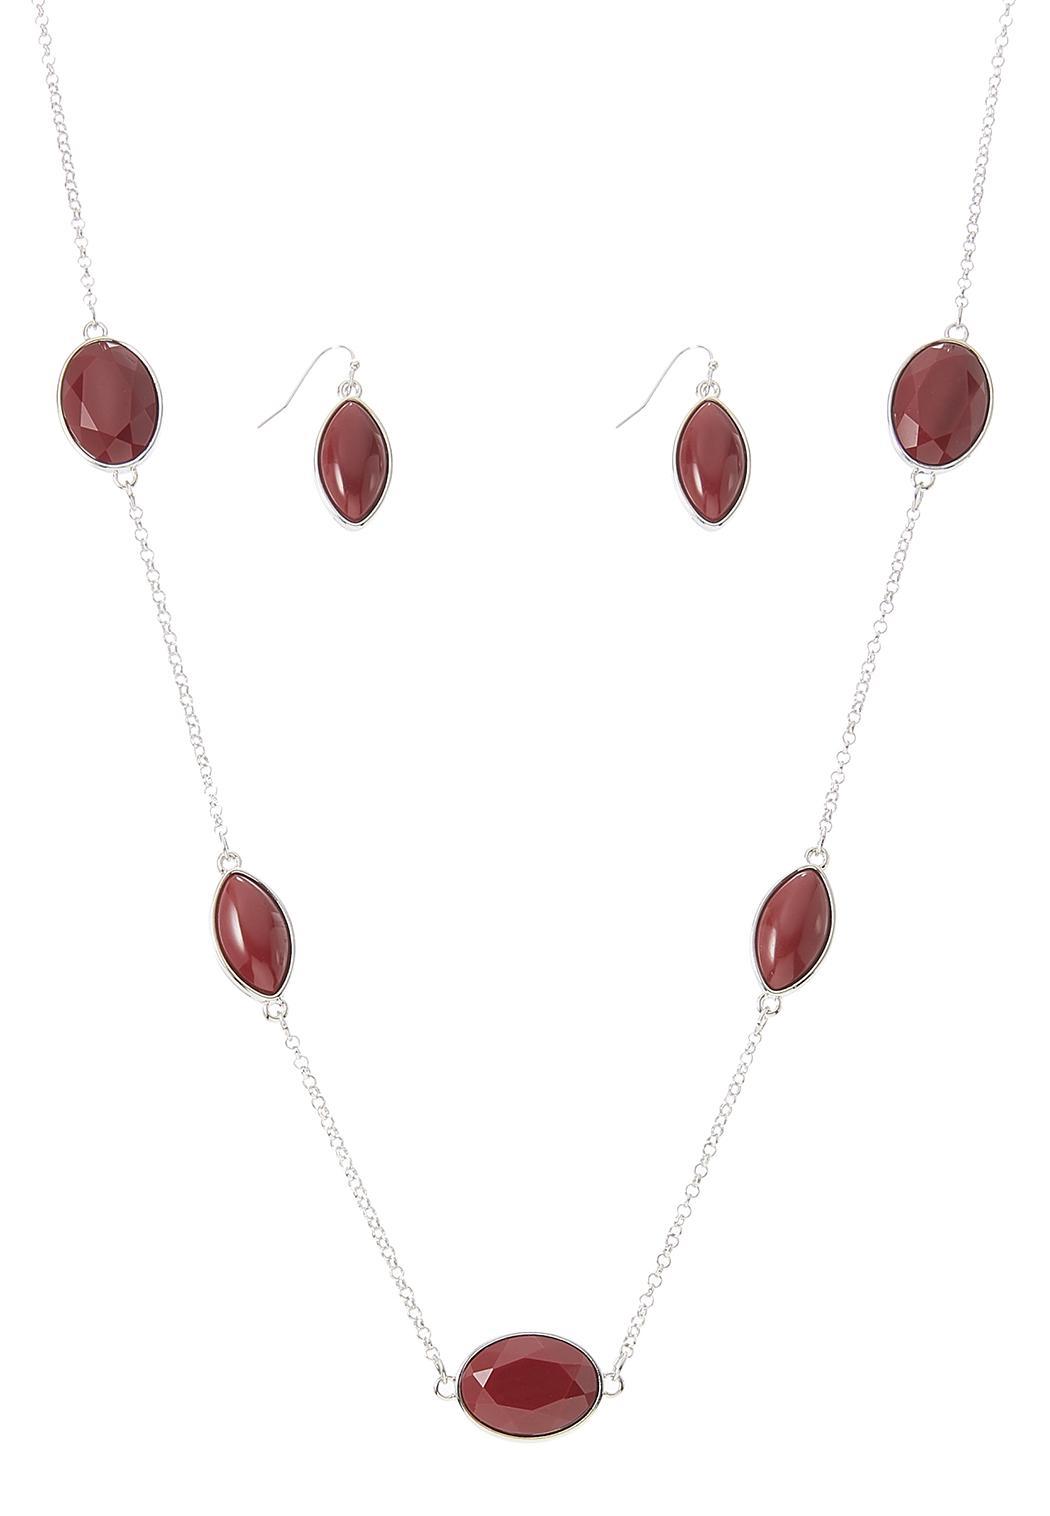 Acrylic Bead Necklace Earring Set